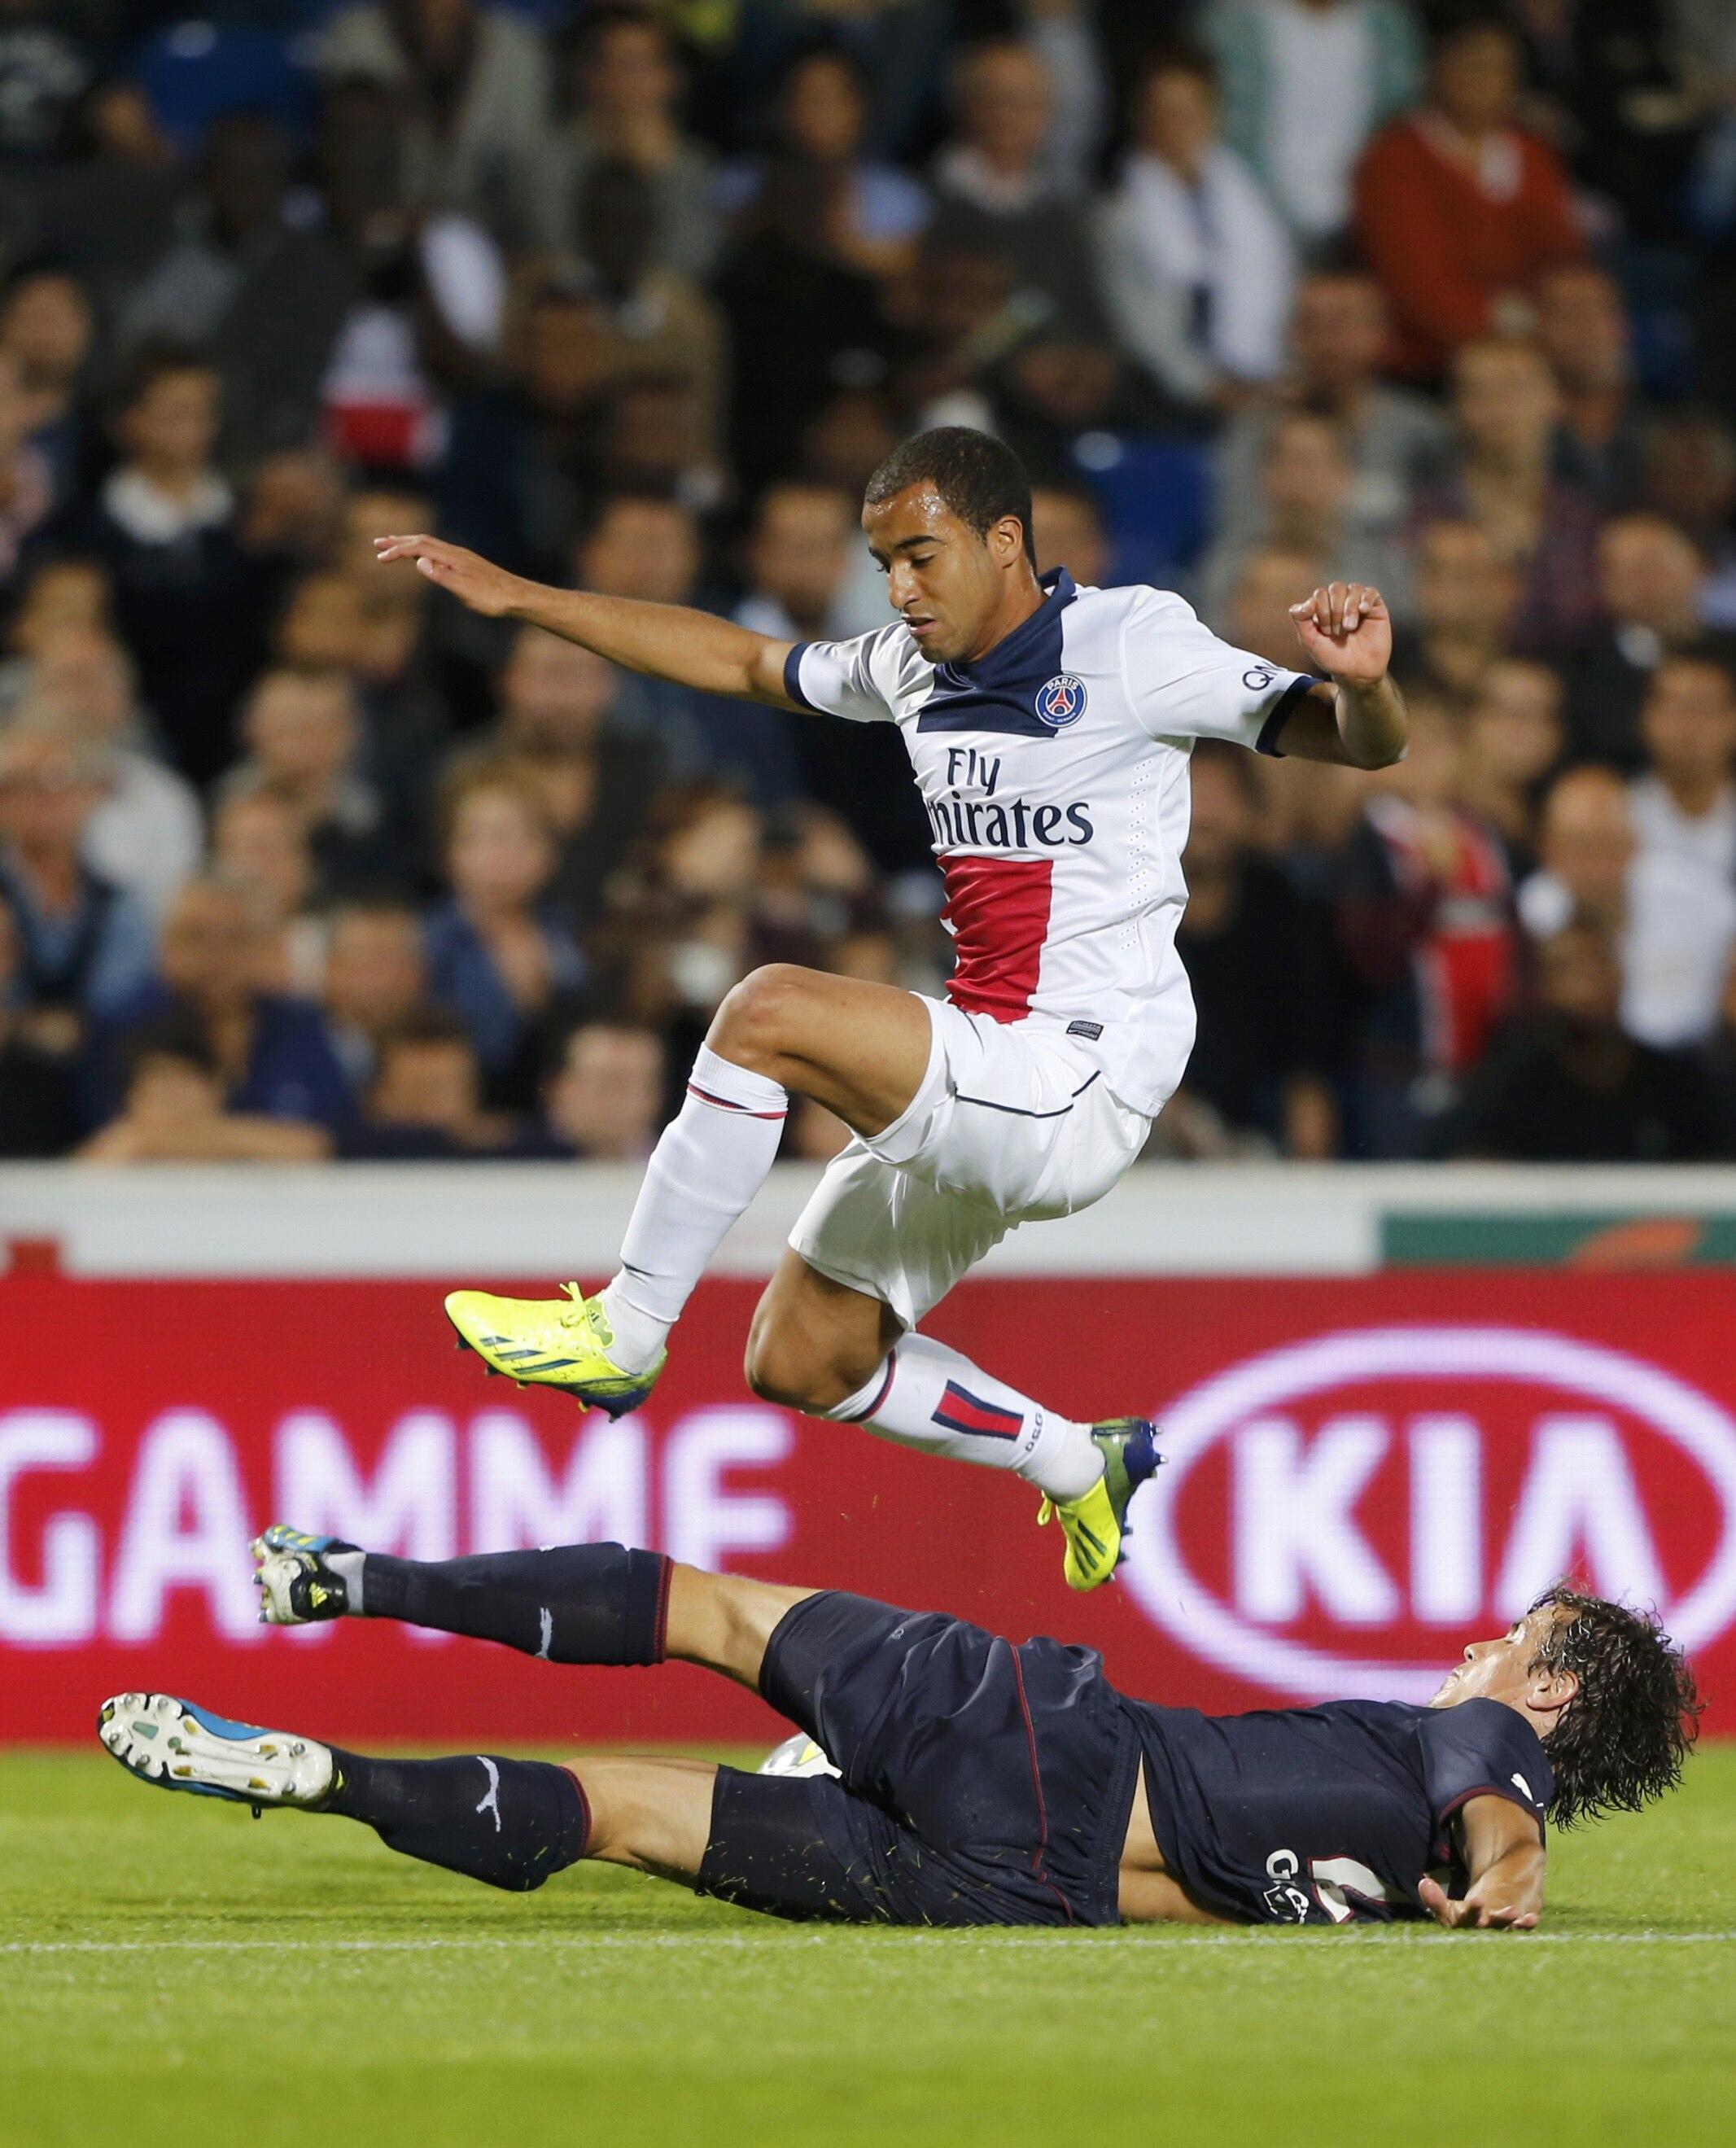 O jogador Lucas, durante partida entre o PSG e o Bordeaux pelo campeonato francês